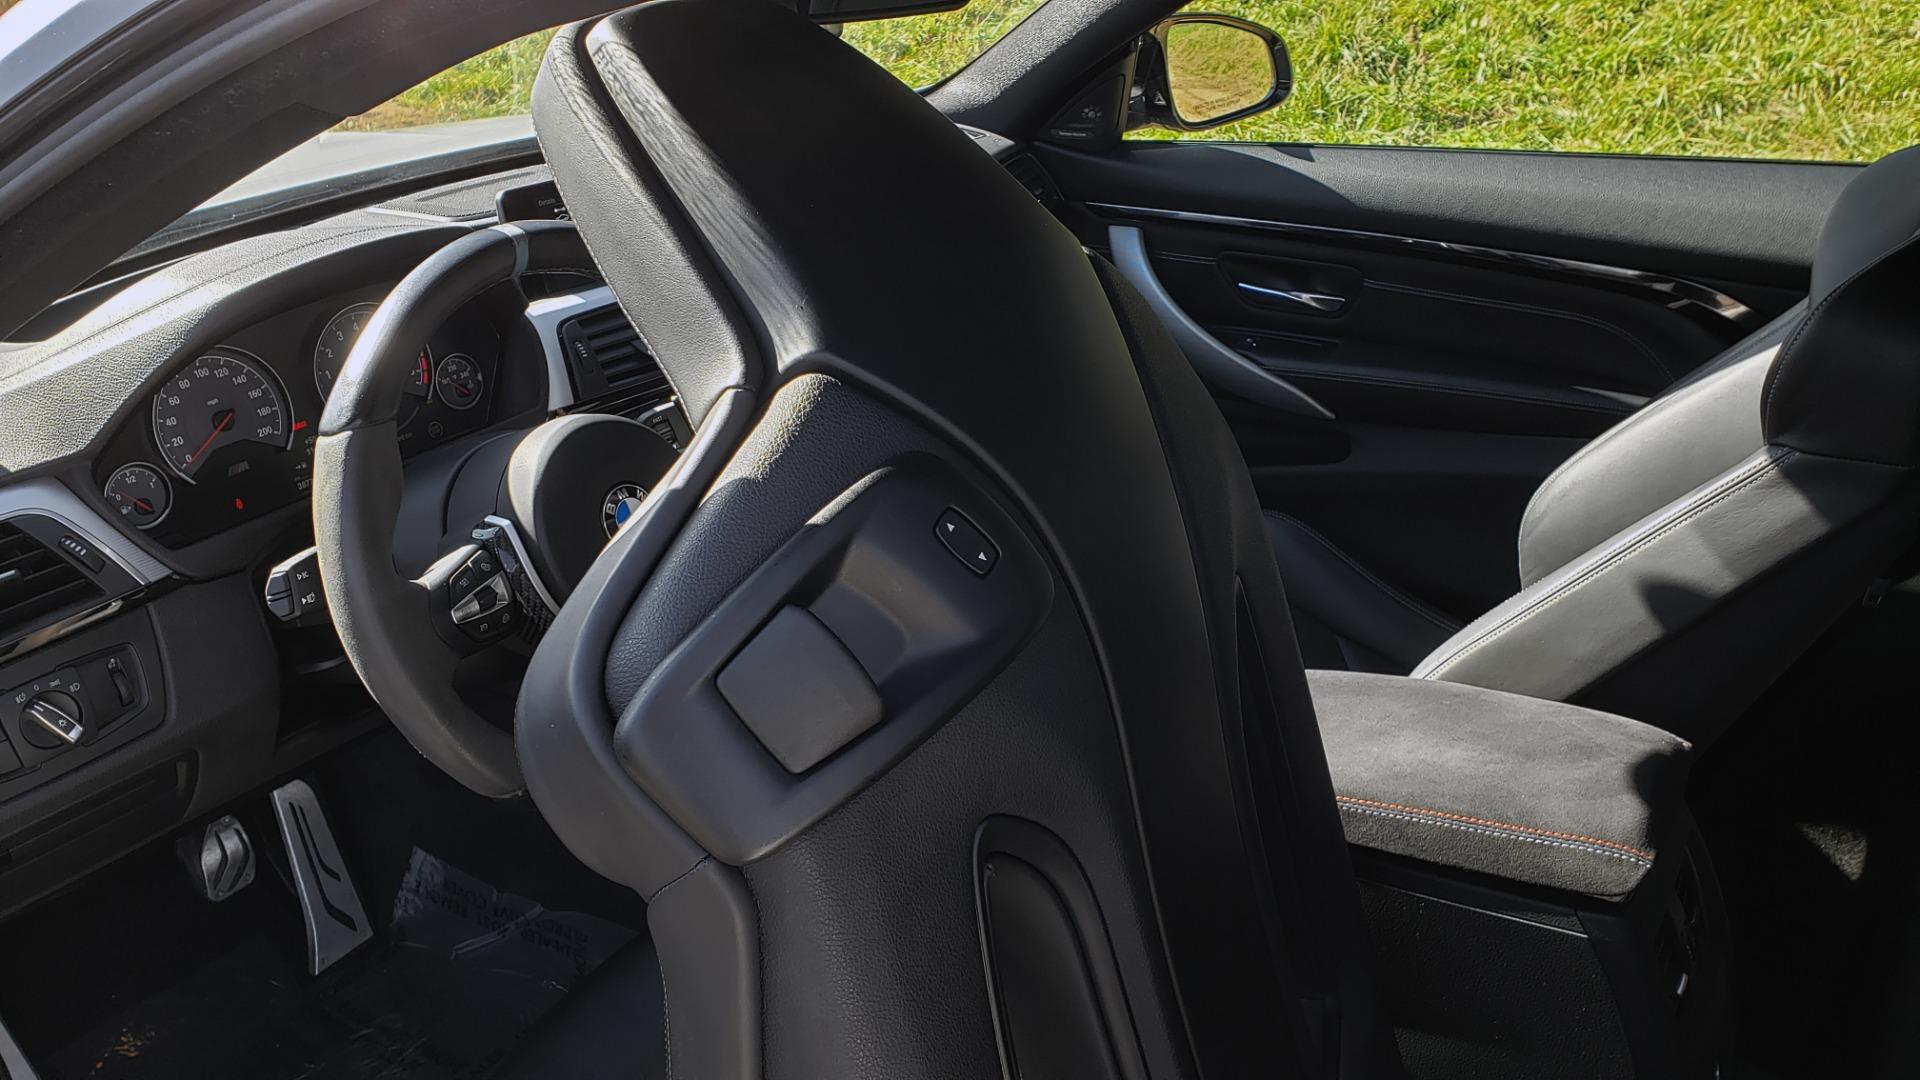 Used 2018 BMW M4 COMP PKG / EXEC / M-DRIVER / PARK CNTRL / ACTIVE BLIND SPOT for sale $45,449 at Formula Imports in Charlotte NC 28227 60